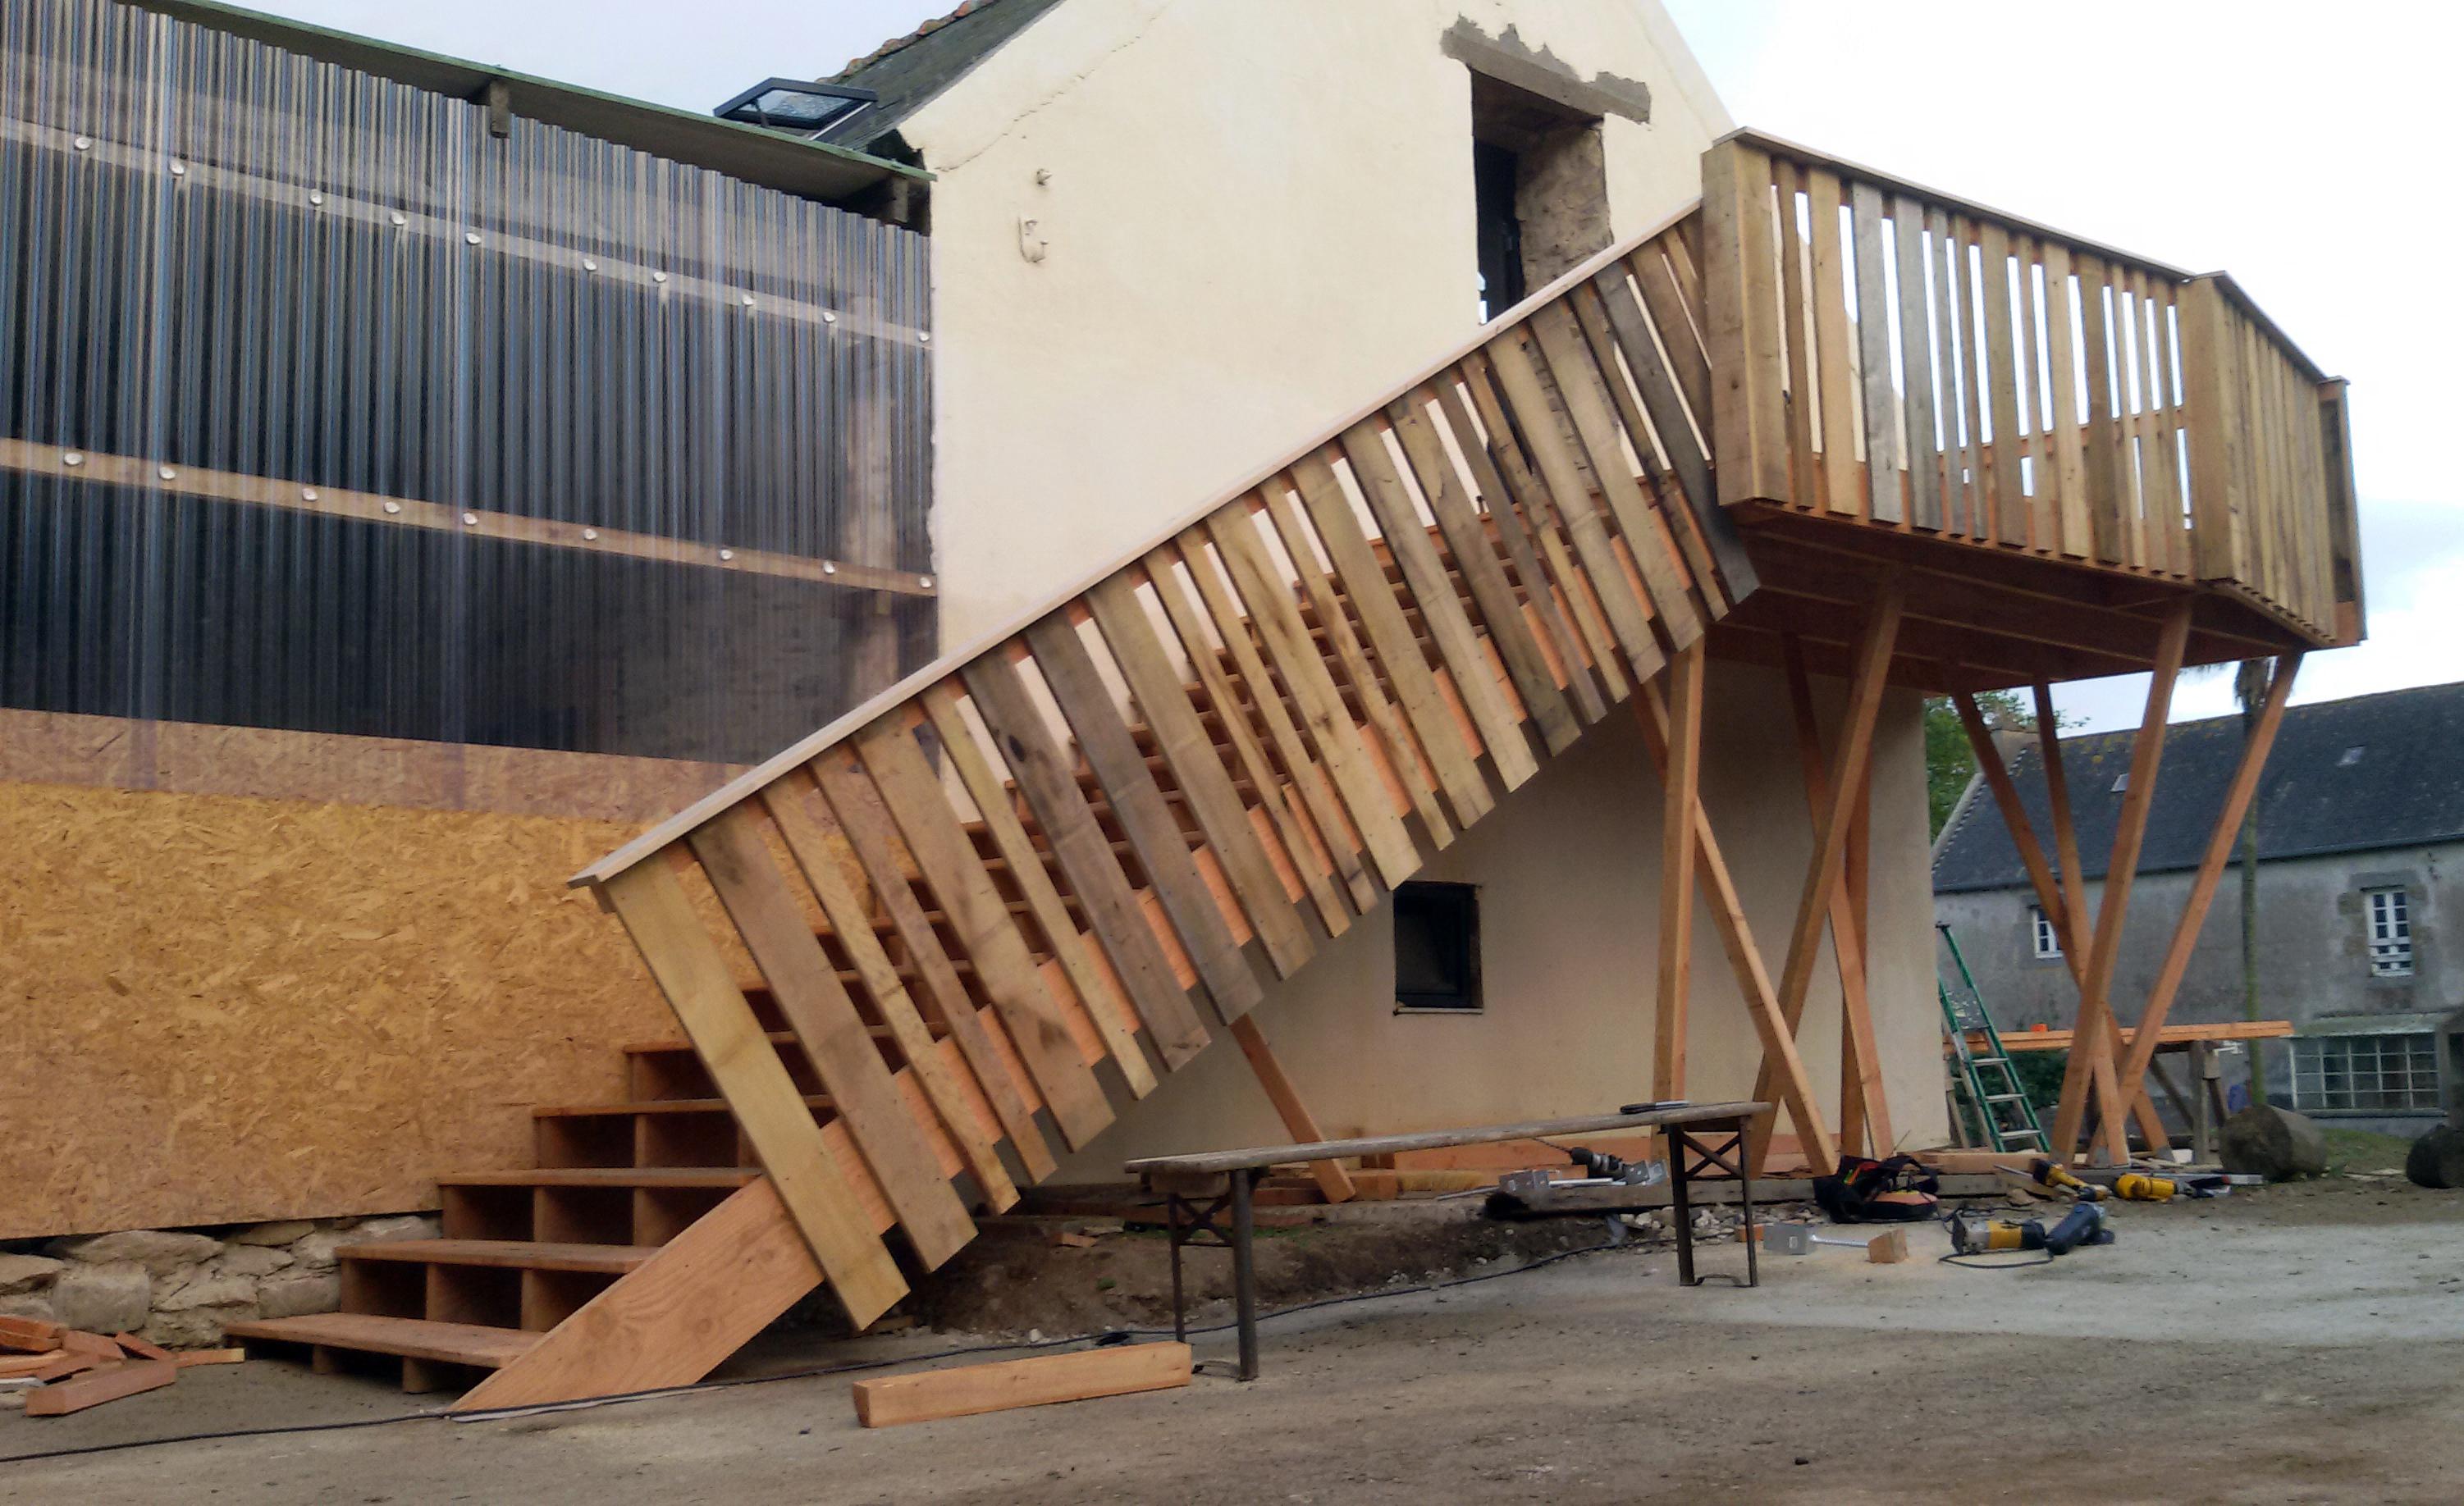 Escalier Ferme de traon Bihan